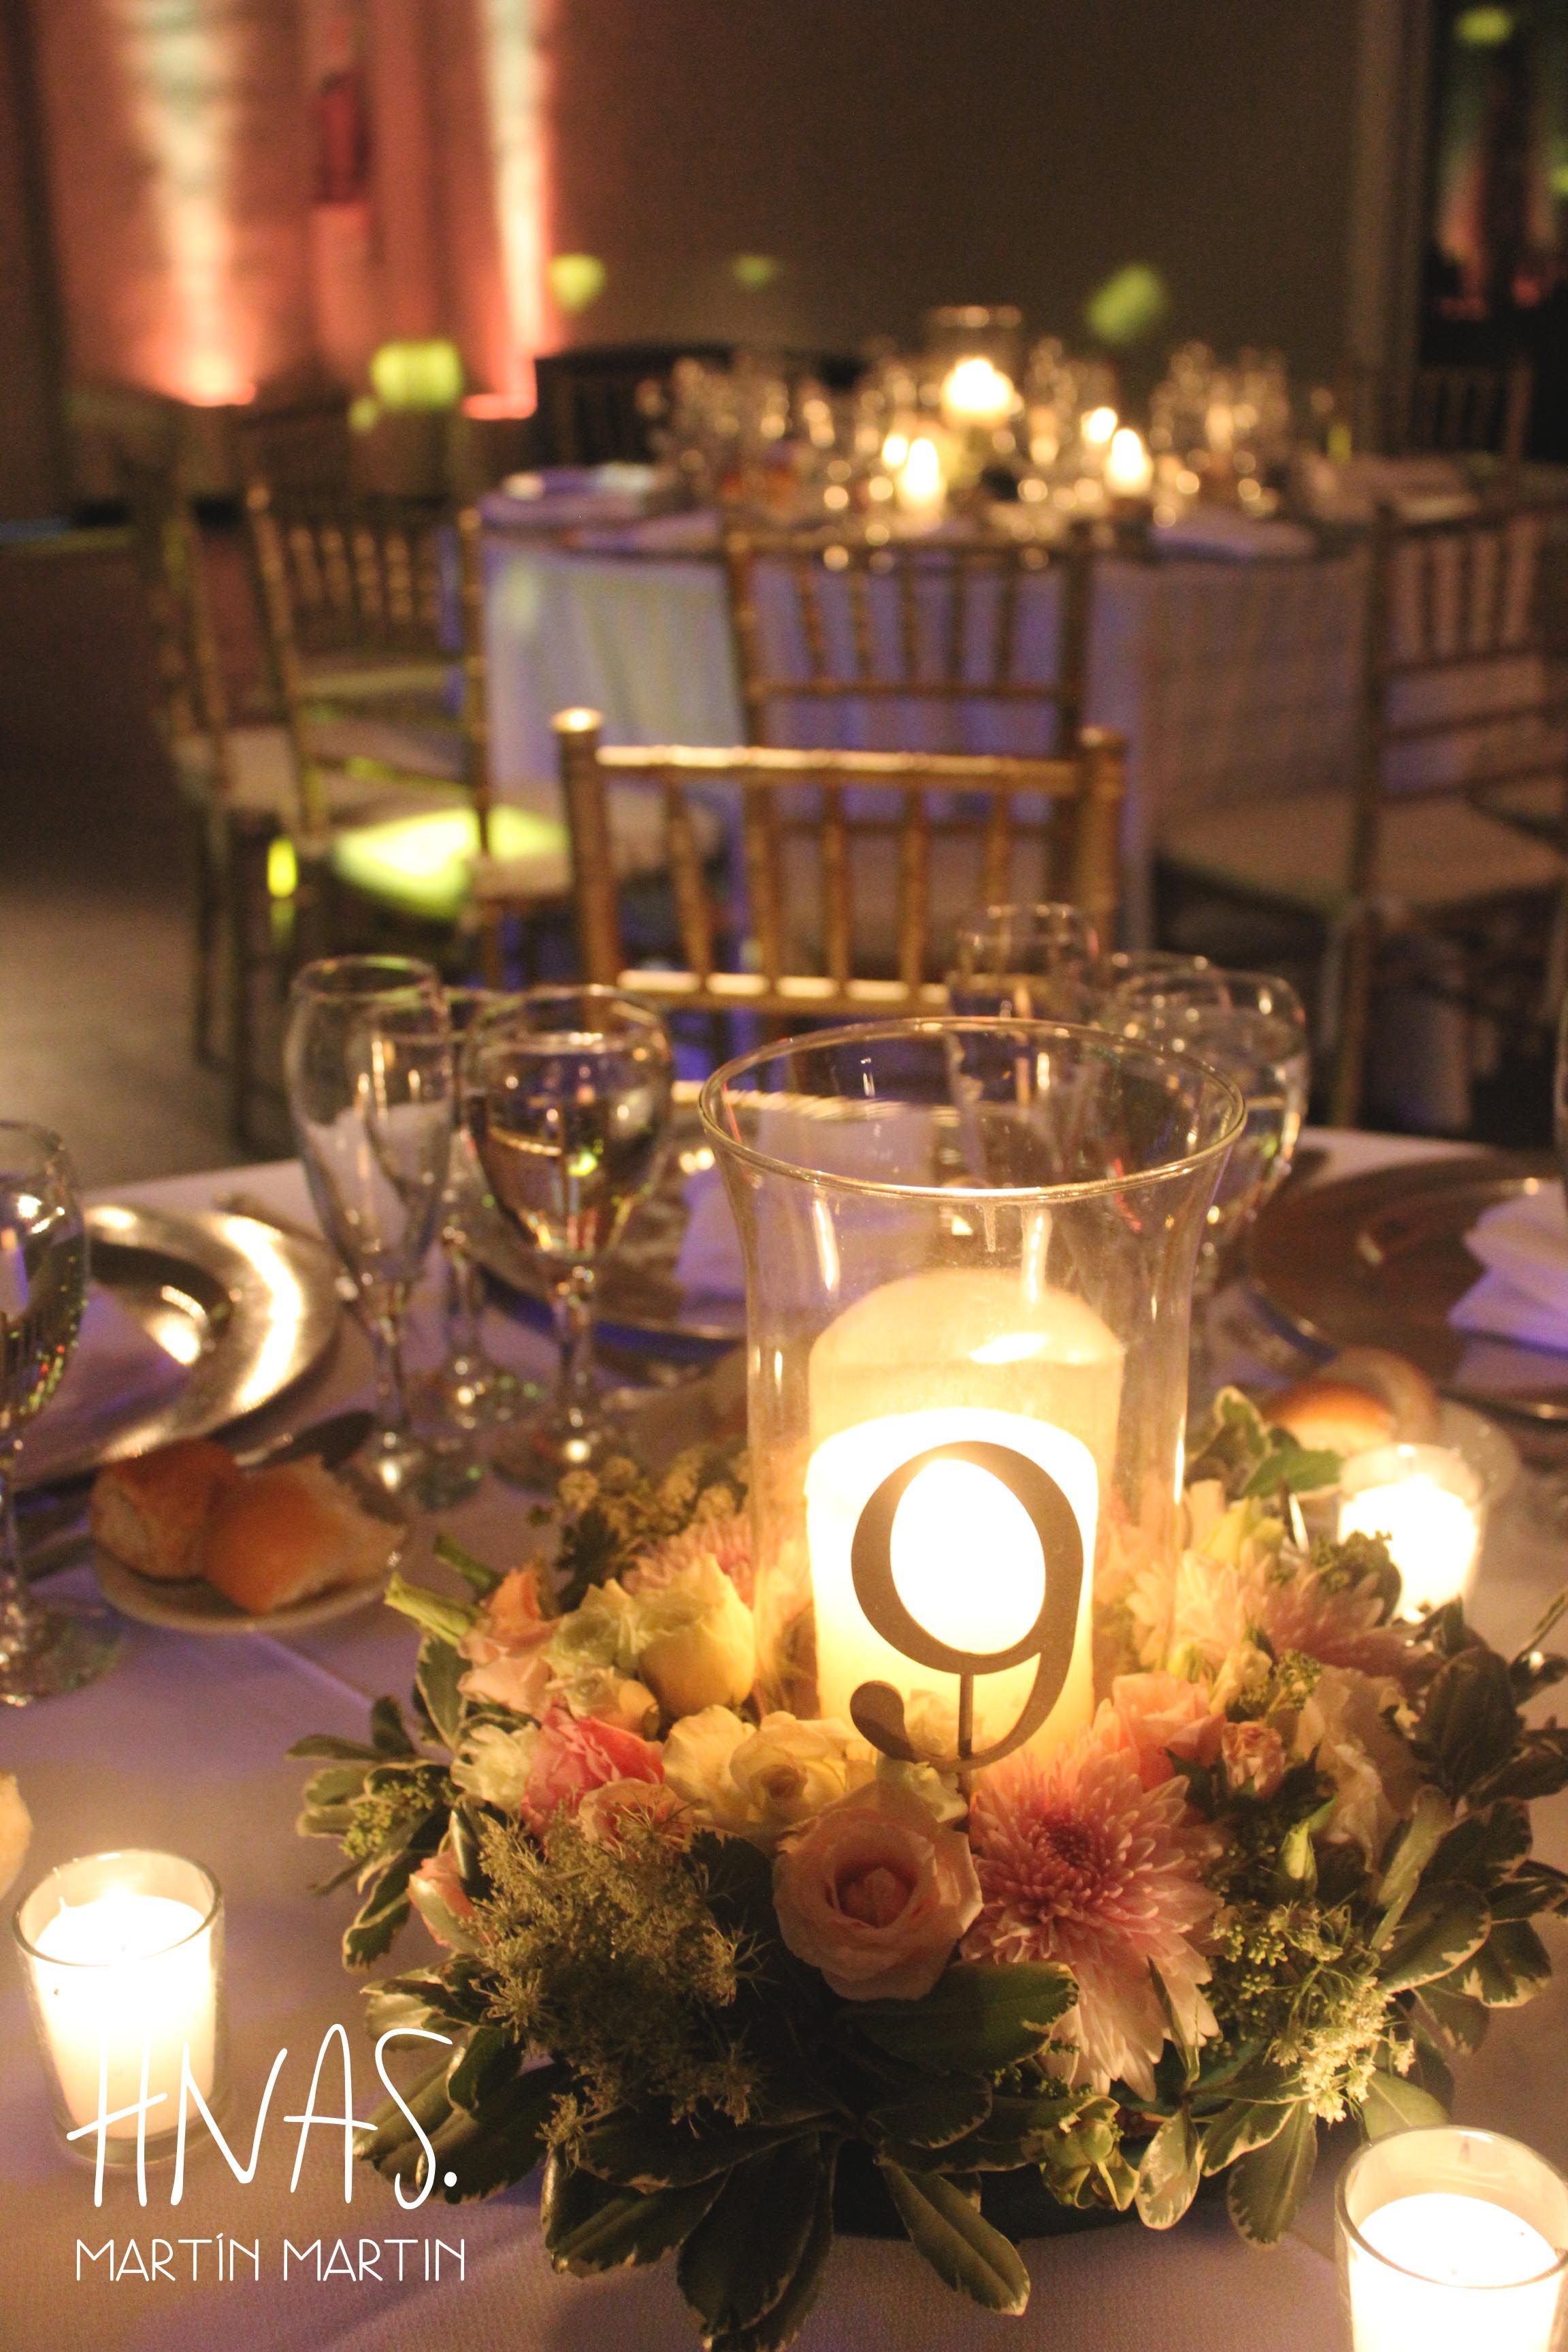 Casamiento Boda Ambientacion Wedding Decor Centros De Mesa Flores Peonias Velas Centerpieces Centro De Mesa Casamiento Mesas De Boda Mesa De Matrimonio